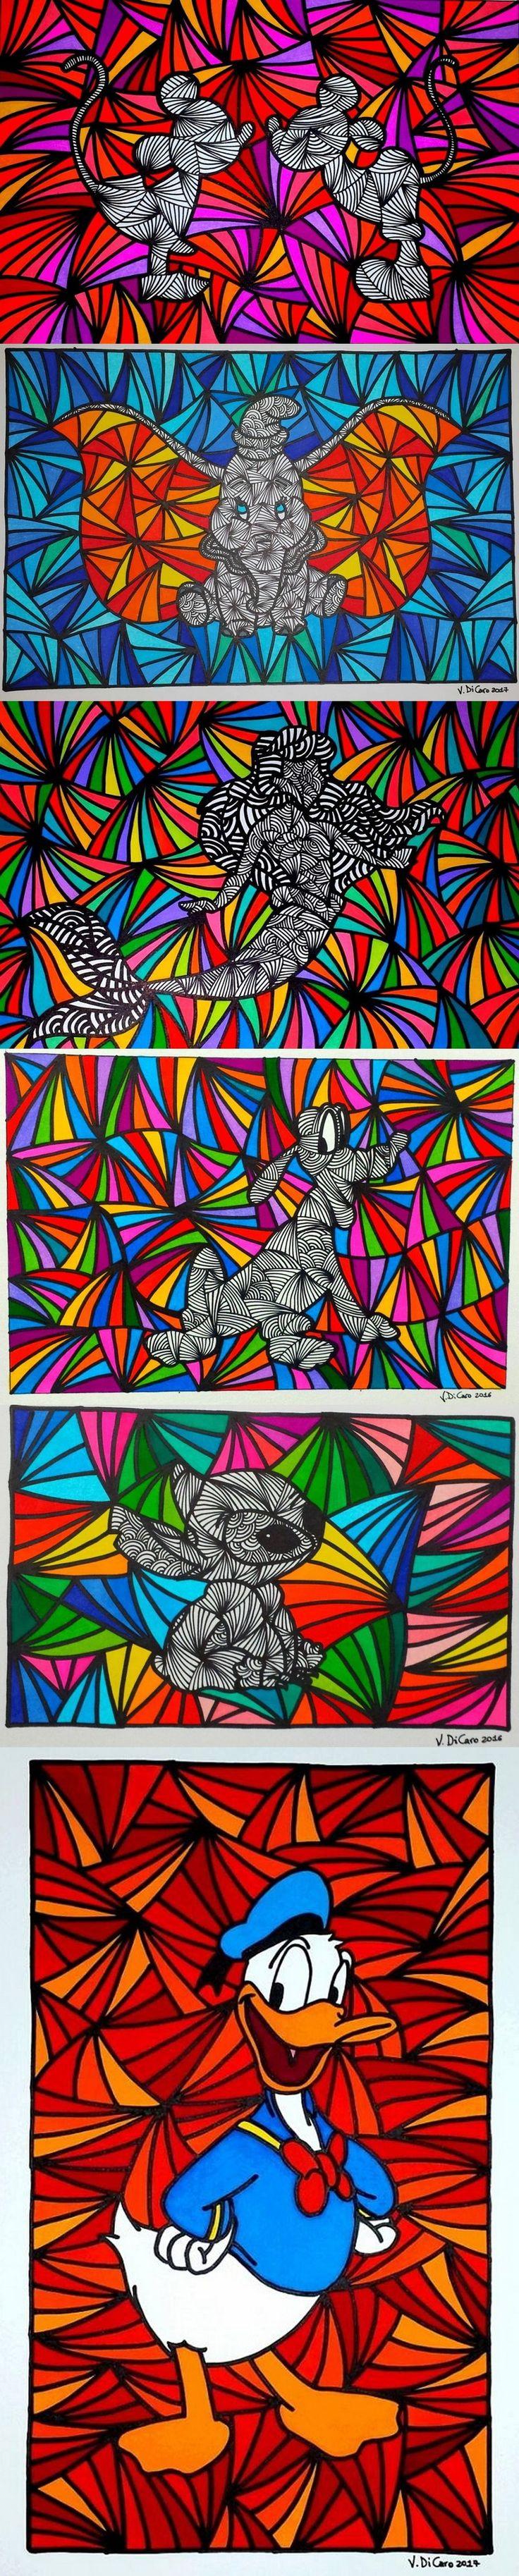 Disney Characters As Pen Drawings By Vince Di Caro